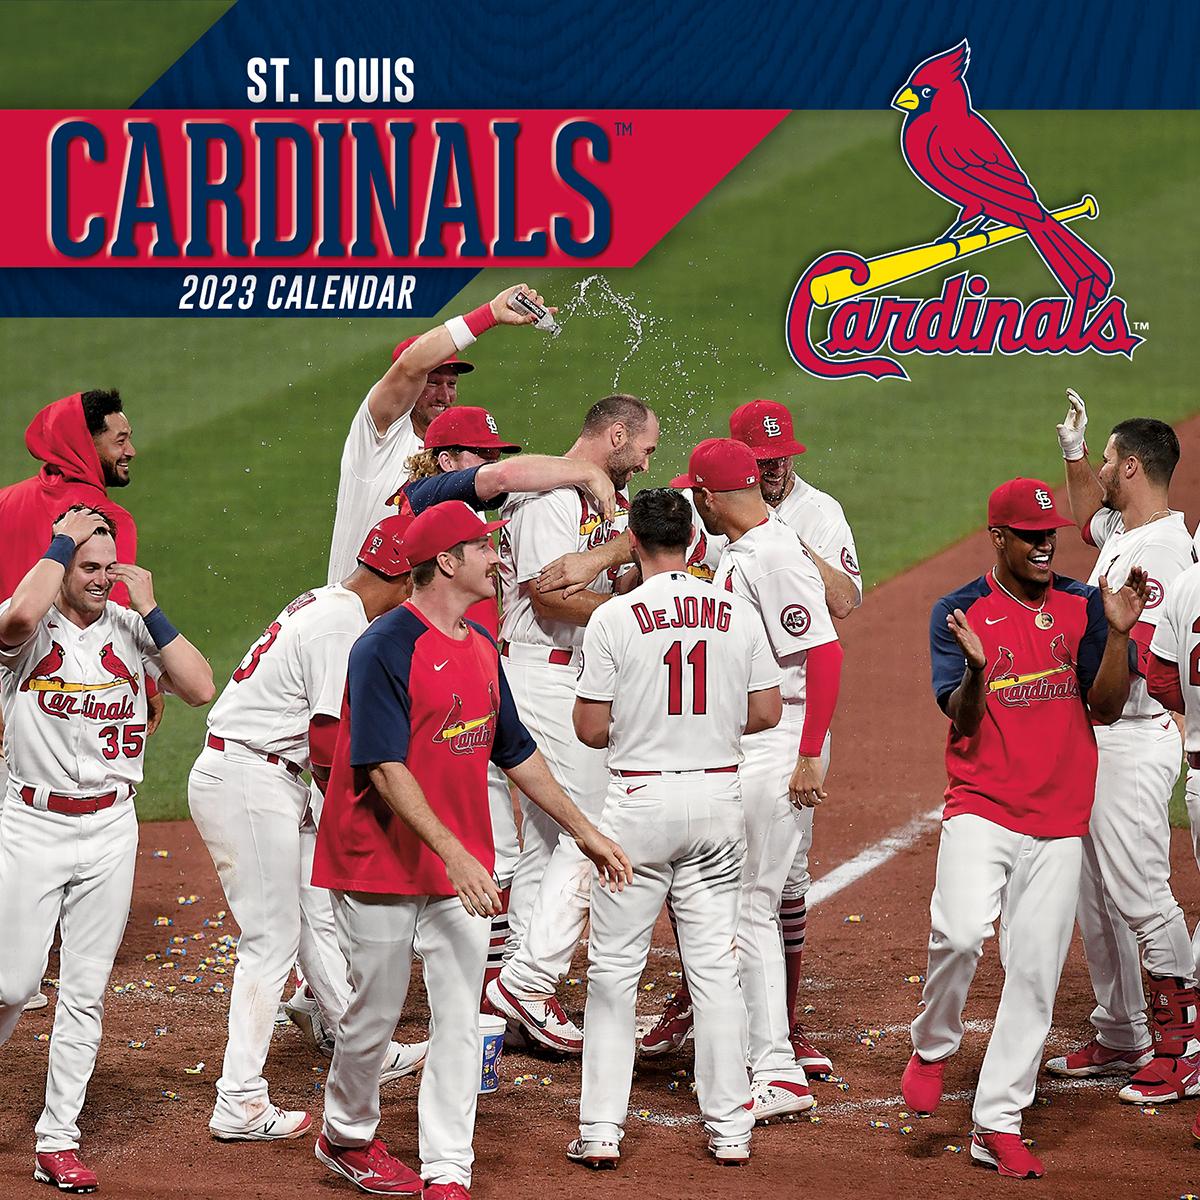 St Louis Cardinals 2018 Wall Calendar Buy At Khc Sports